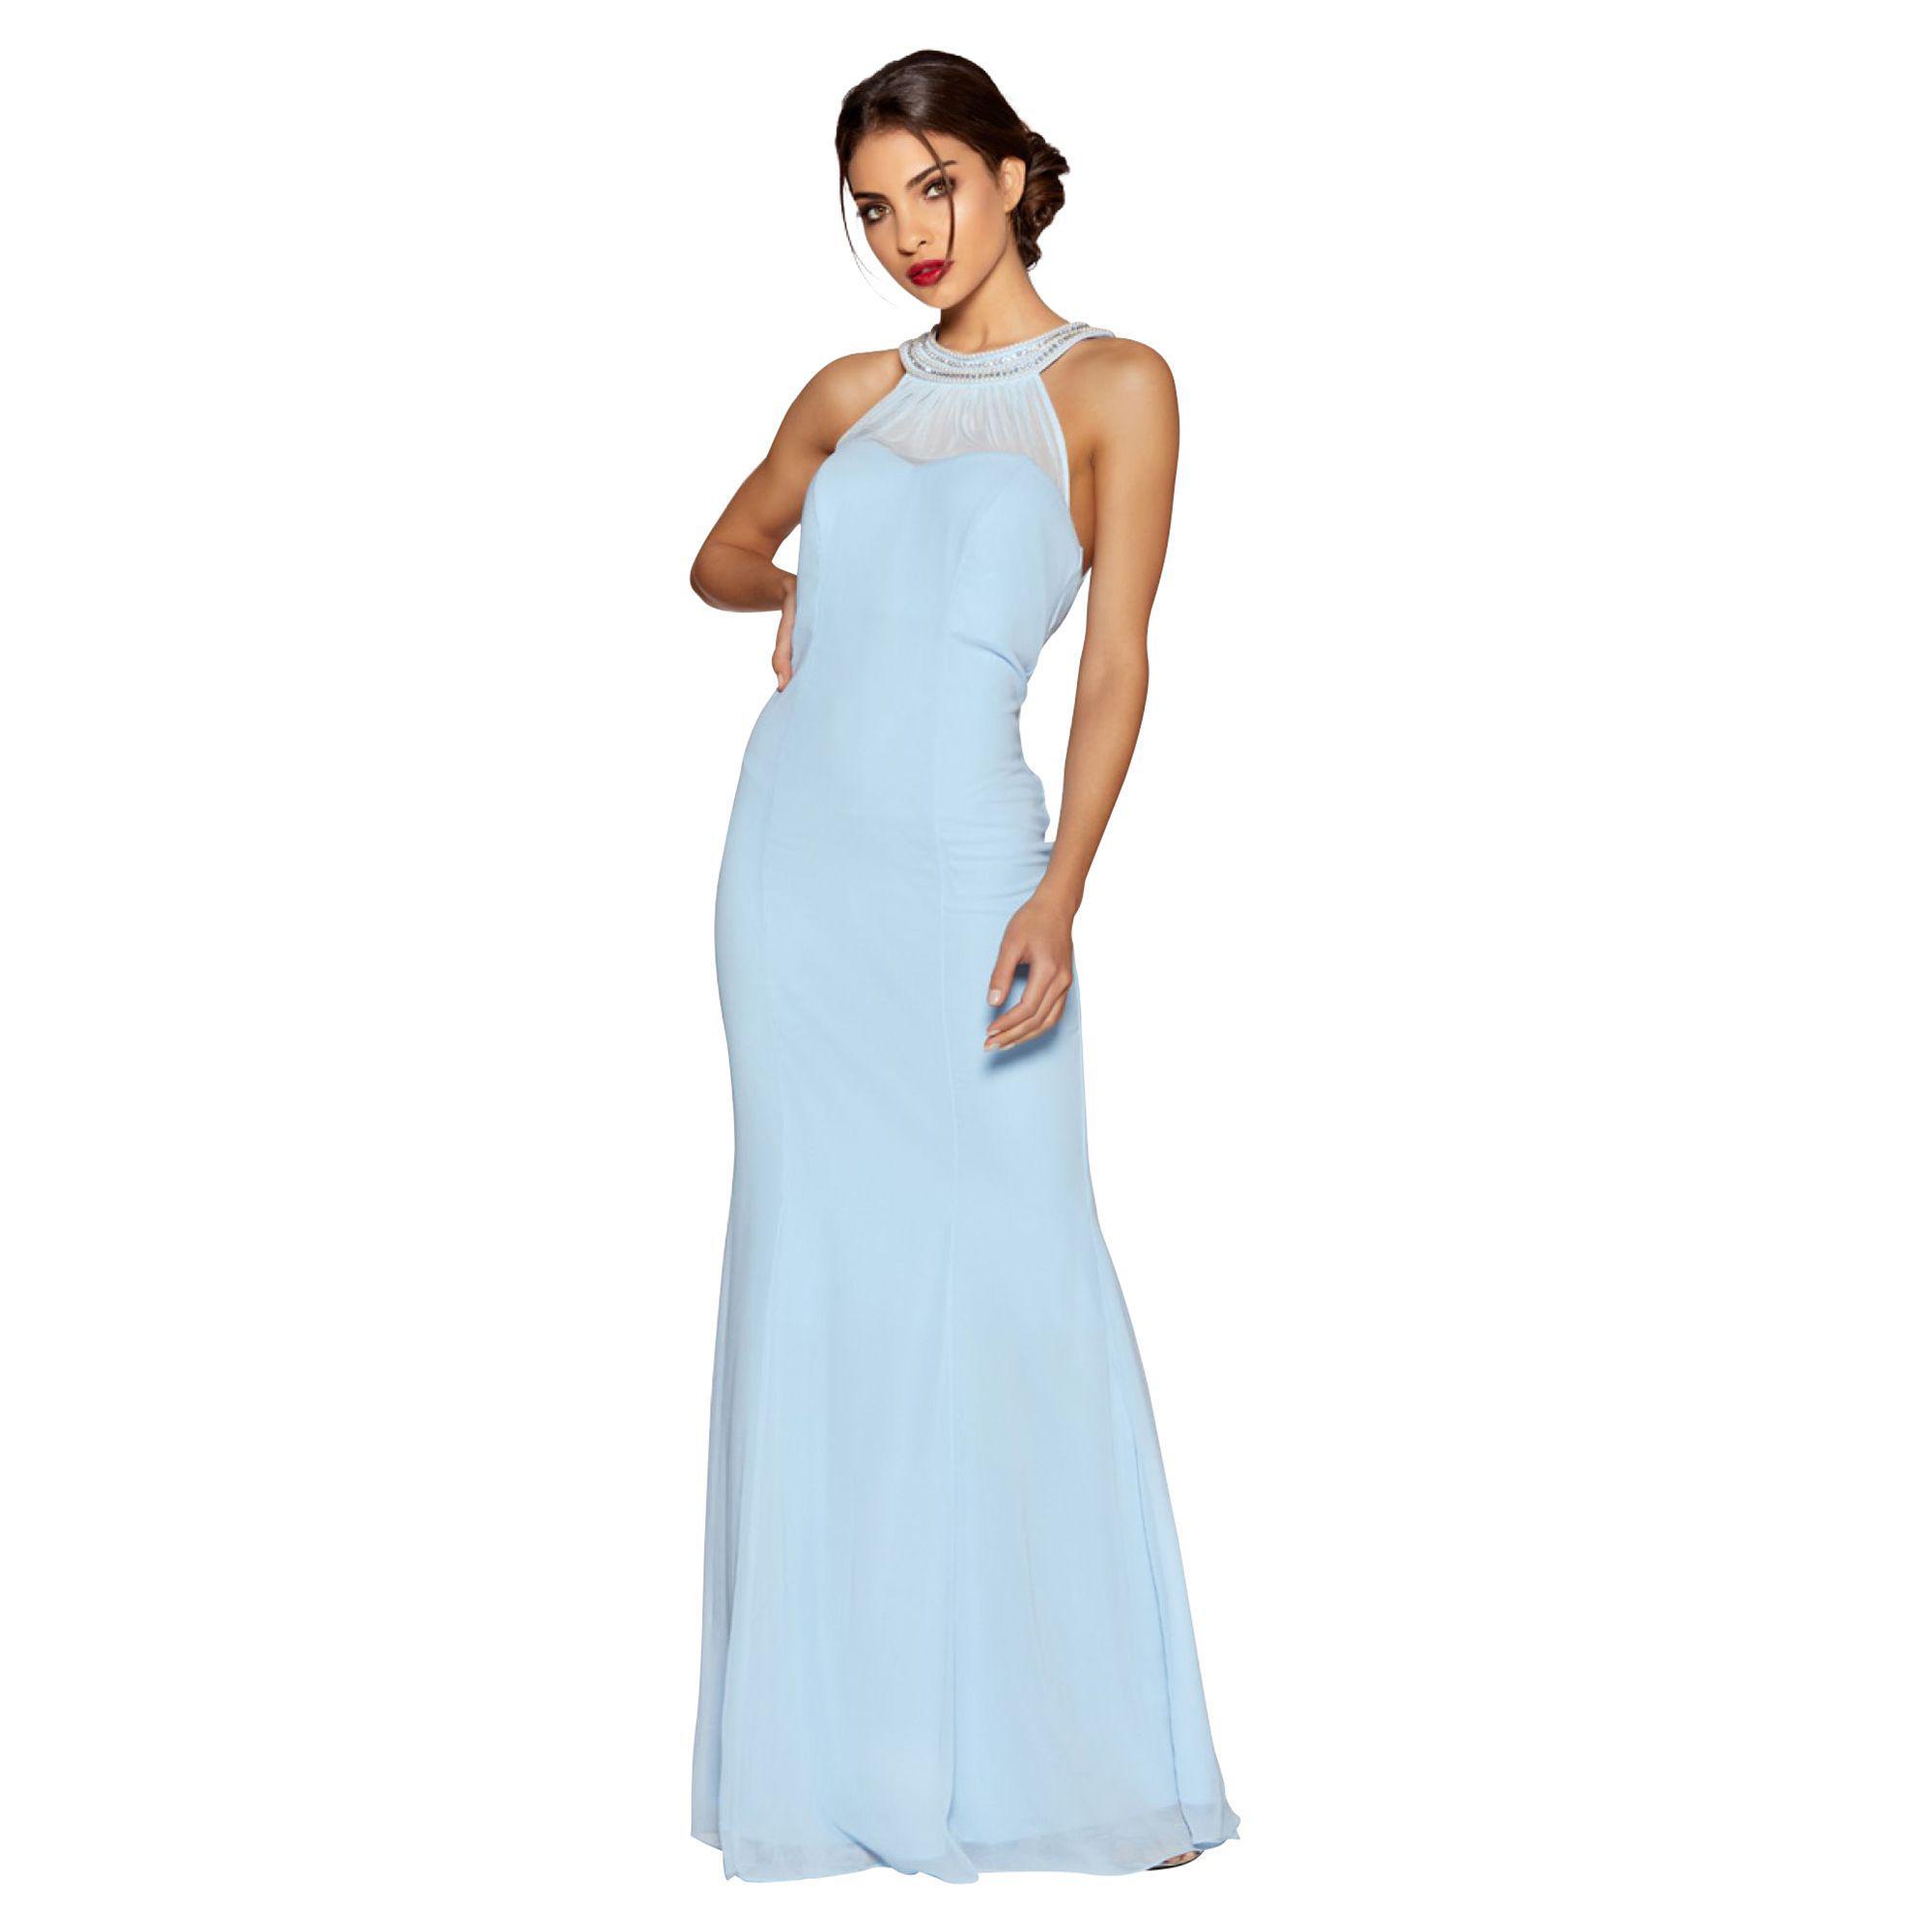 4cb6a70898 Quiz - Powder Blue Chiffon Sweetheart Neck Maxi Dress - Lyst. View  fullscreen